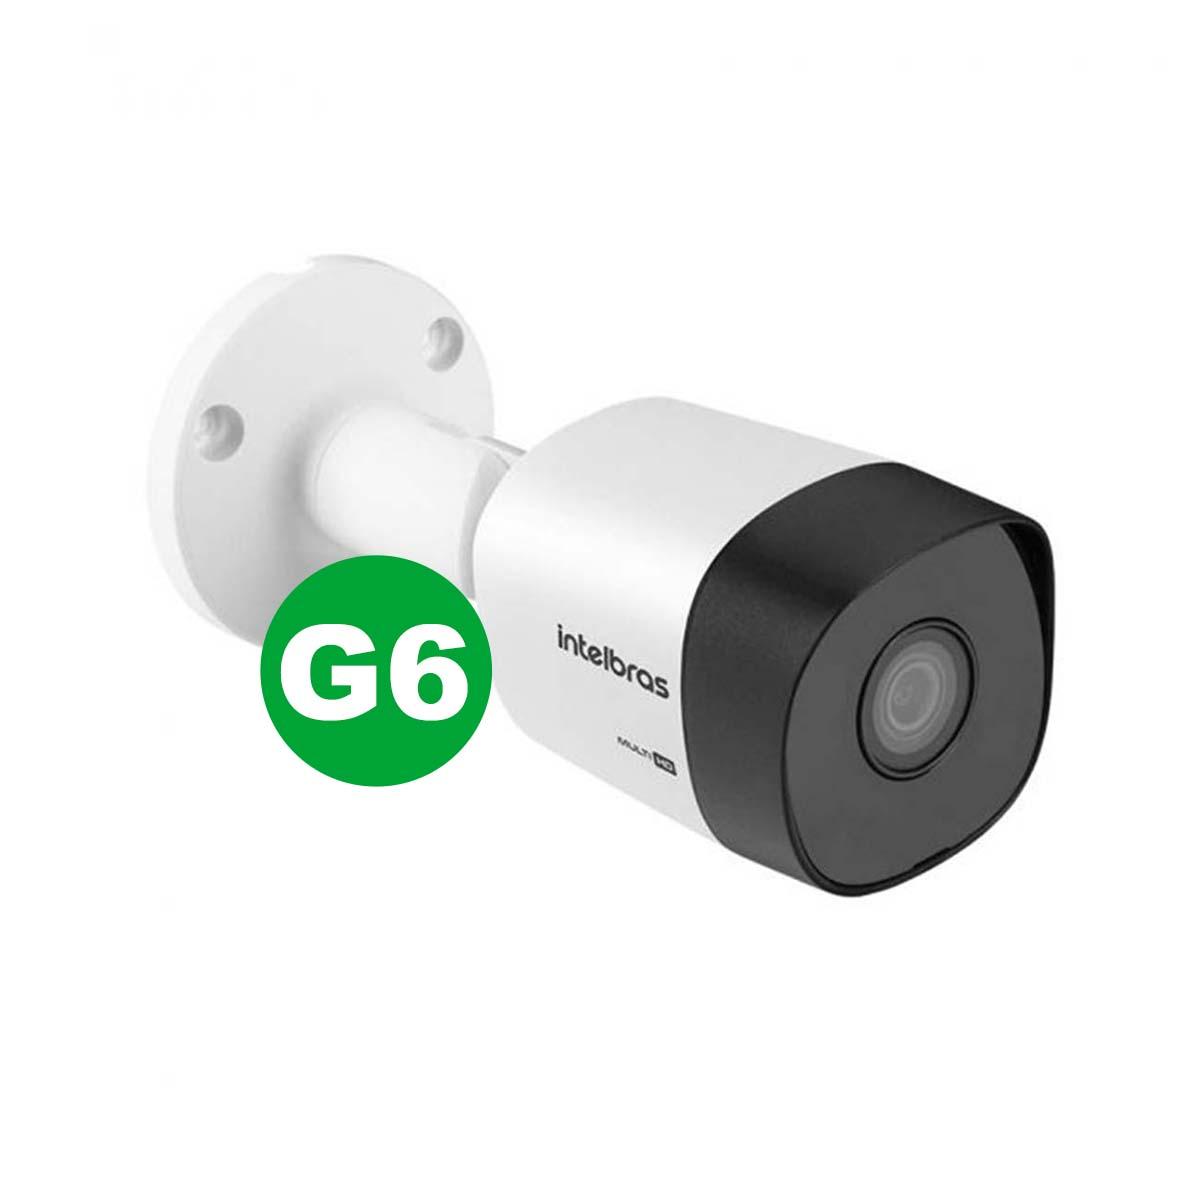 Kit Câmera Bullet Intelbras Vhd 3230 B G6 3.6 mm + Acessórios